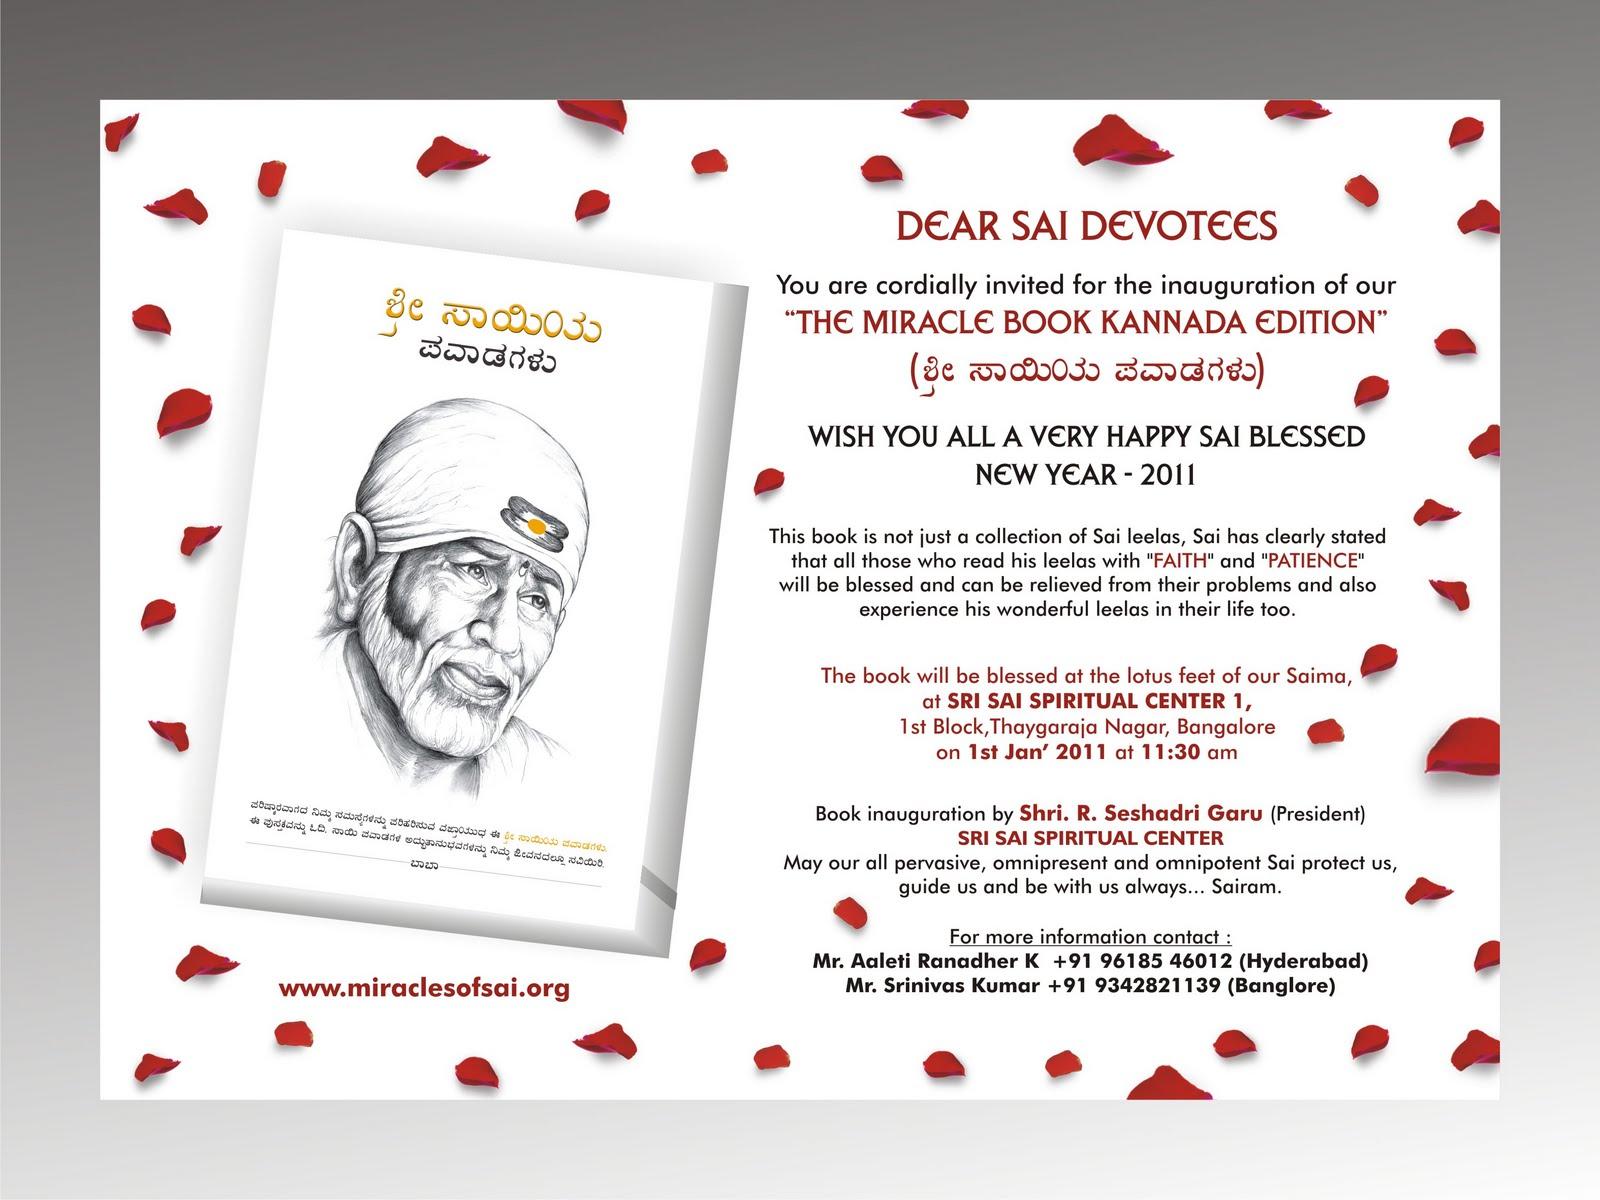 Free Printable Online Wedding Invitations Templates was amazing invitation layout